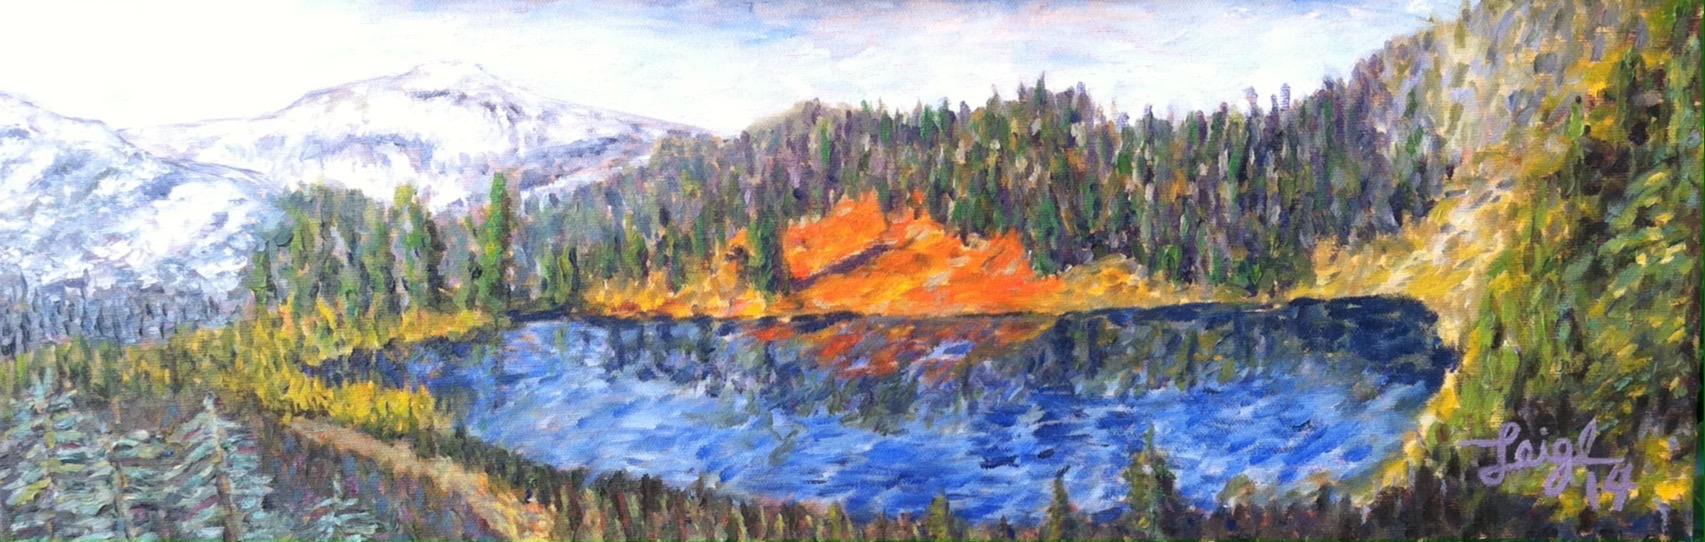 Ben's Mountain Lake  ~  Mardi & Ken Terrill, Blue Lake, CA 2014  •  24 x 8